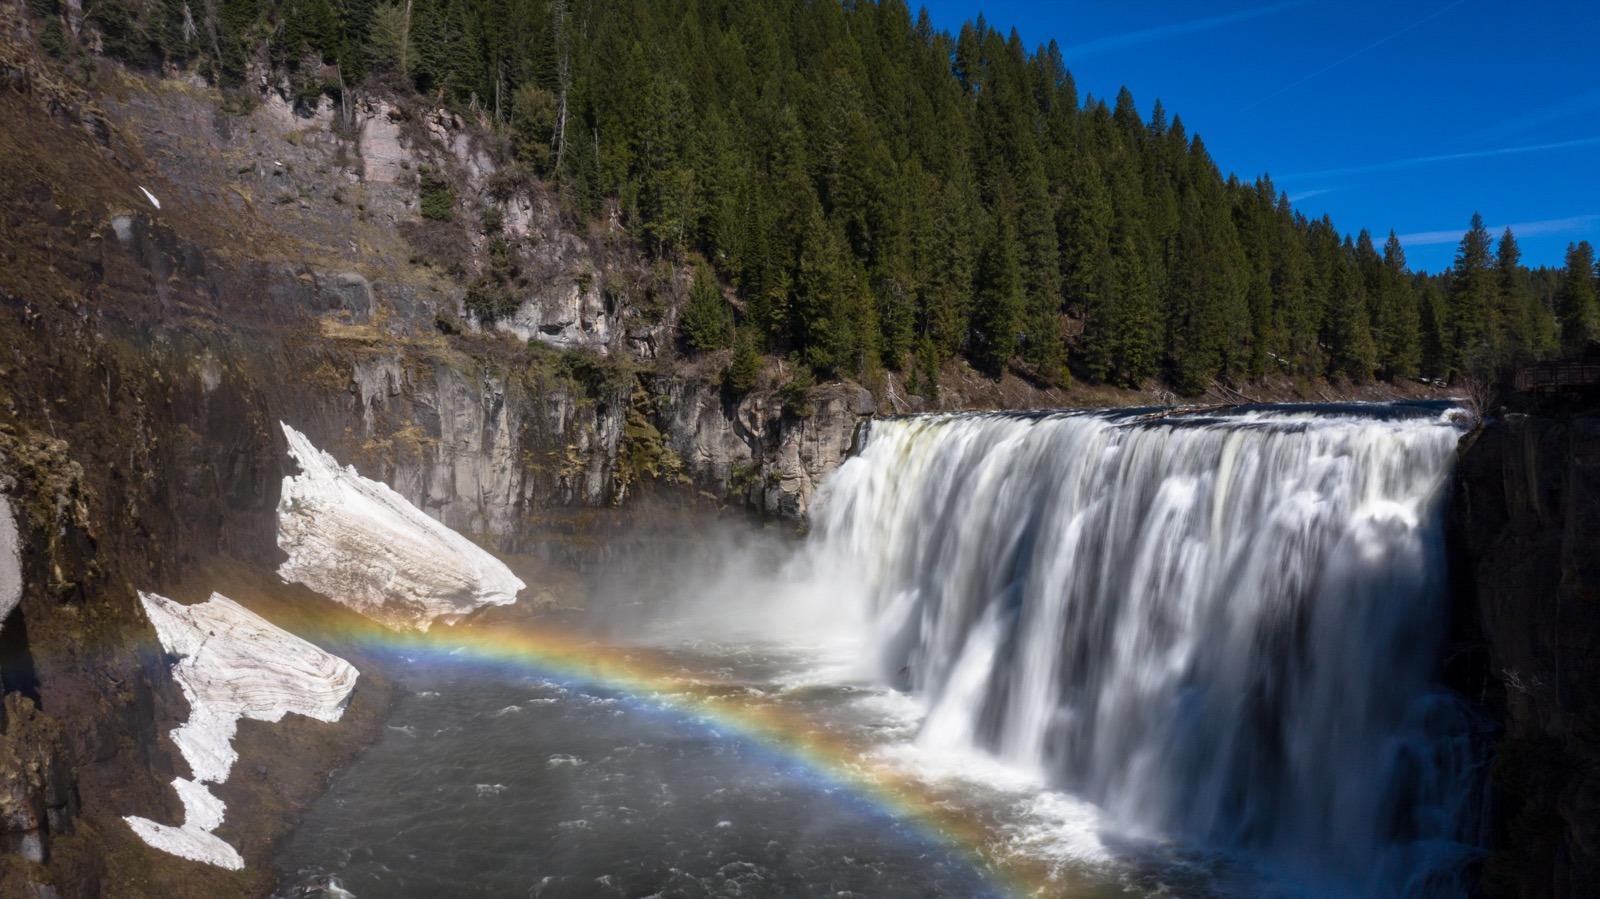 yellowstone-teton-territory-idaho-upper-mesa-falls-rainbow